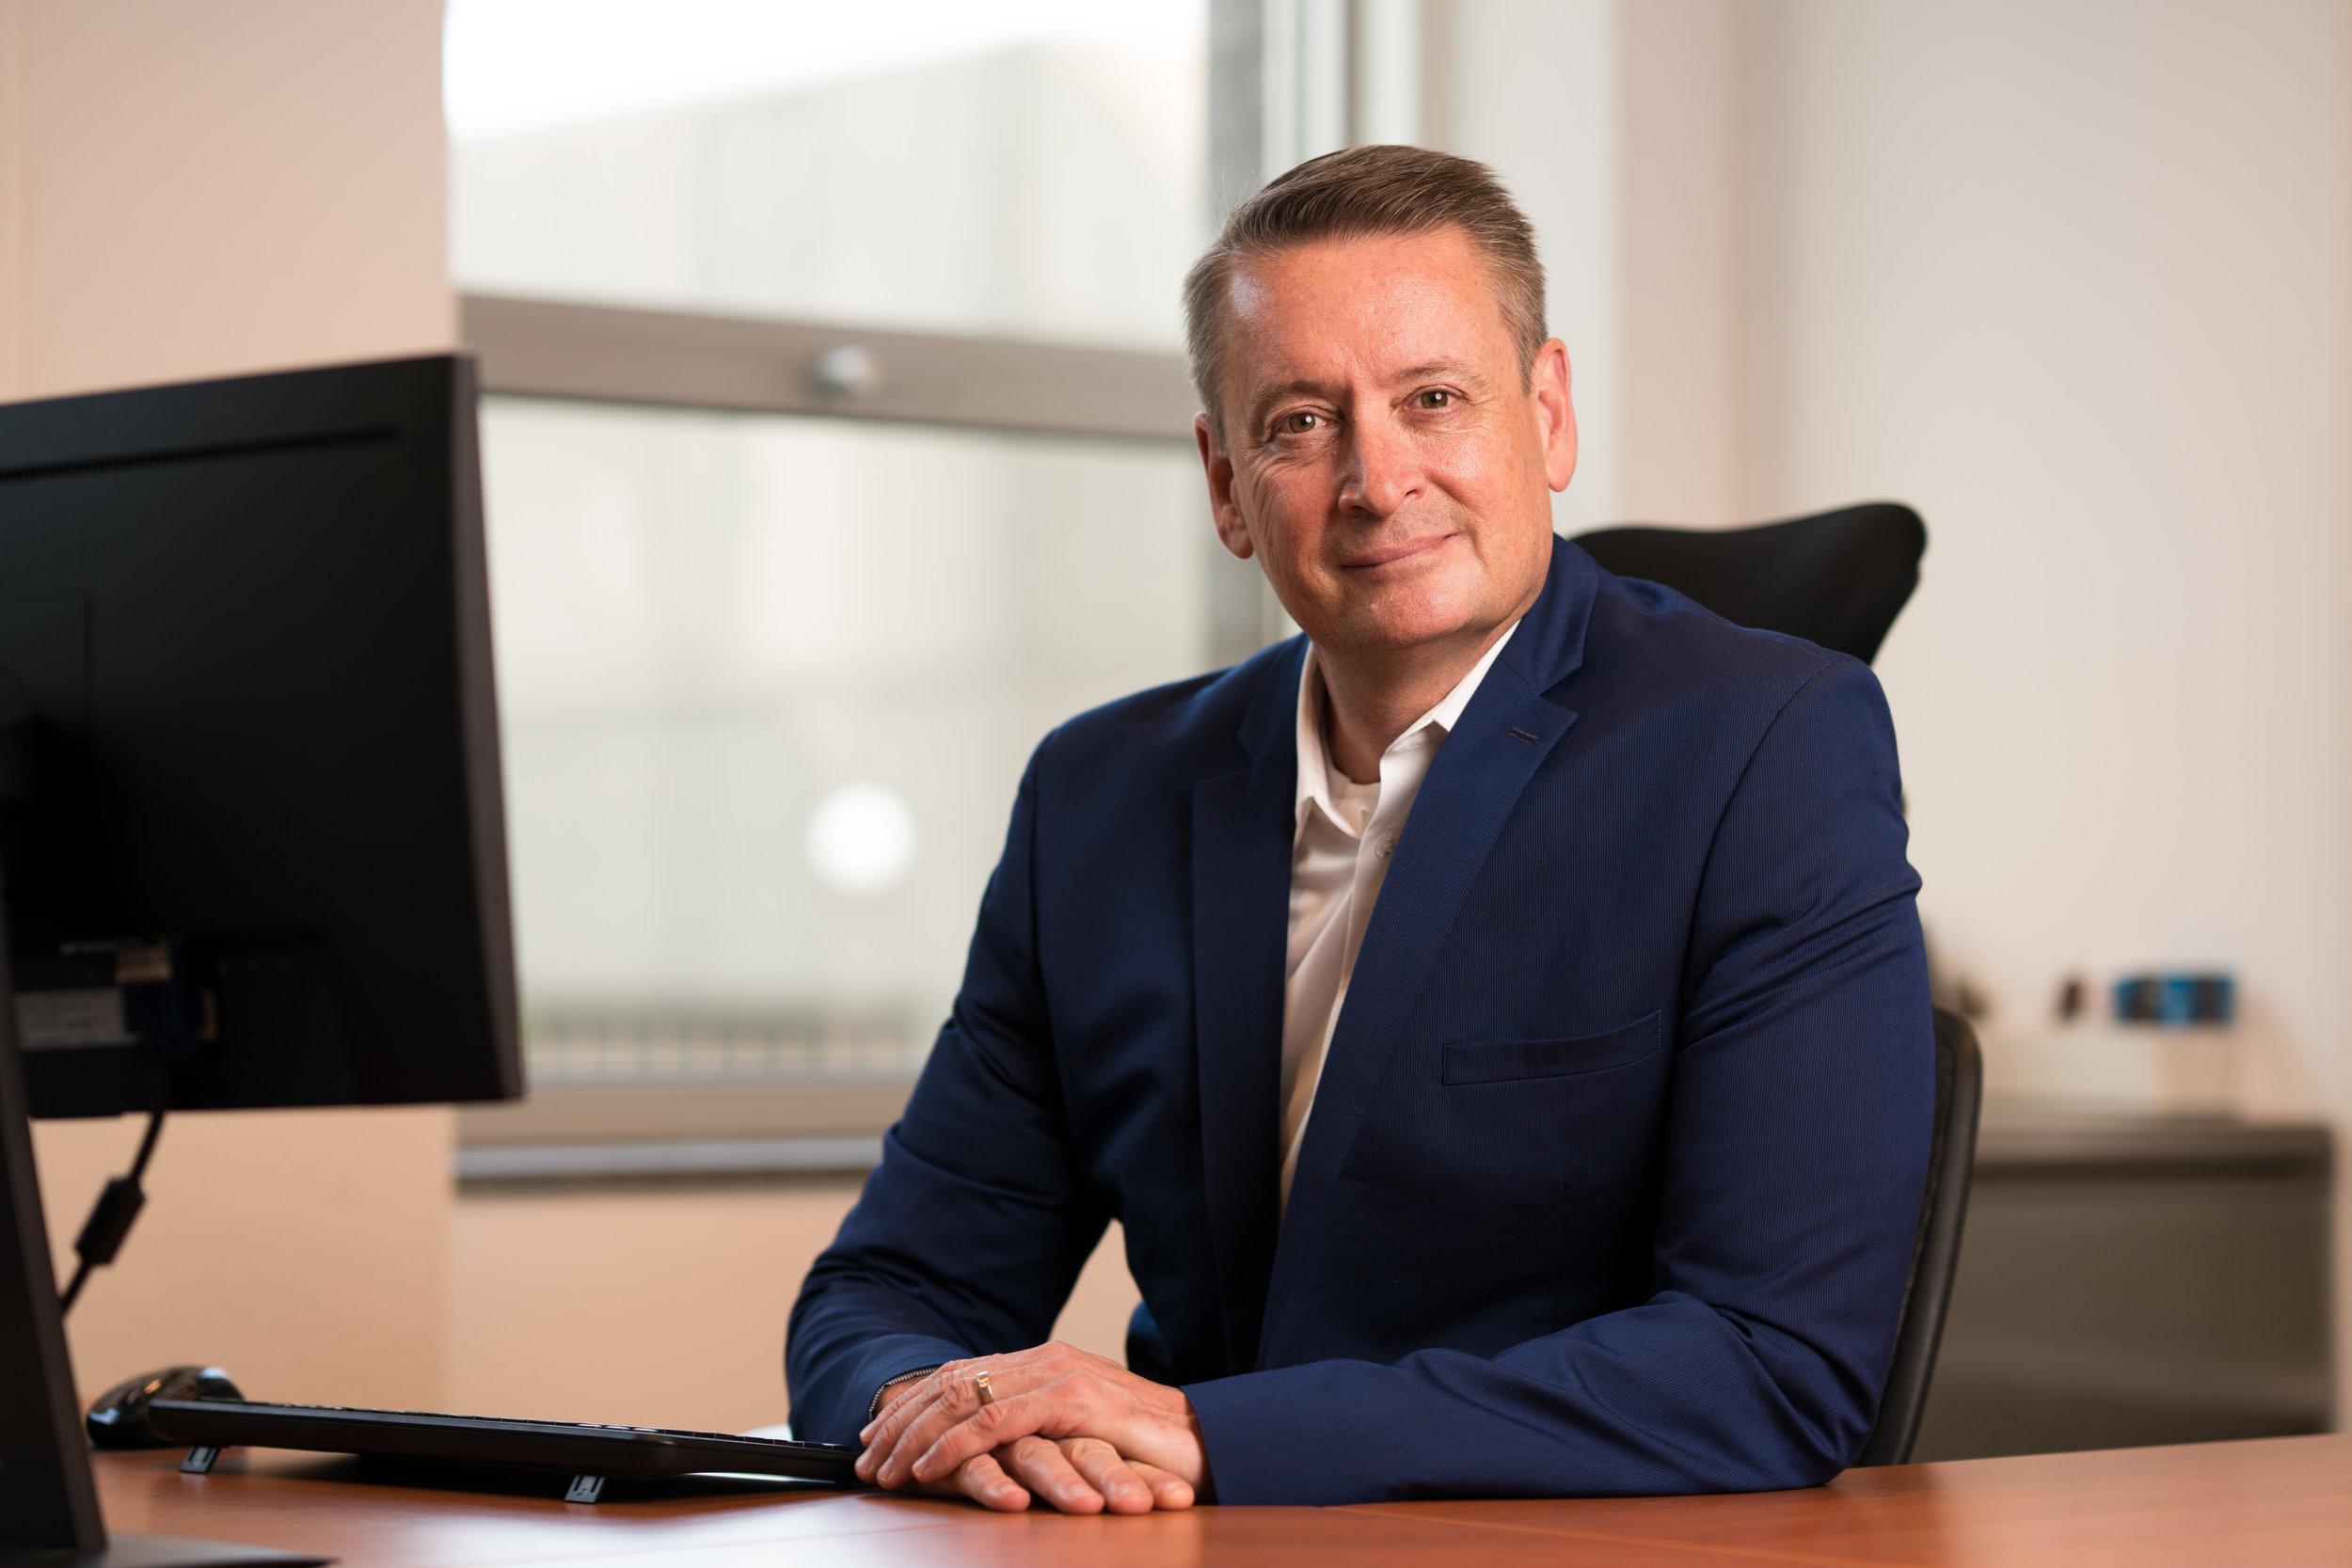 Tim Mohin - Chief Executive at GRI